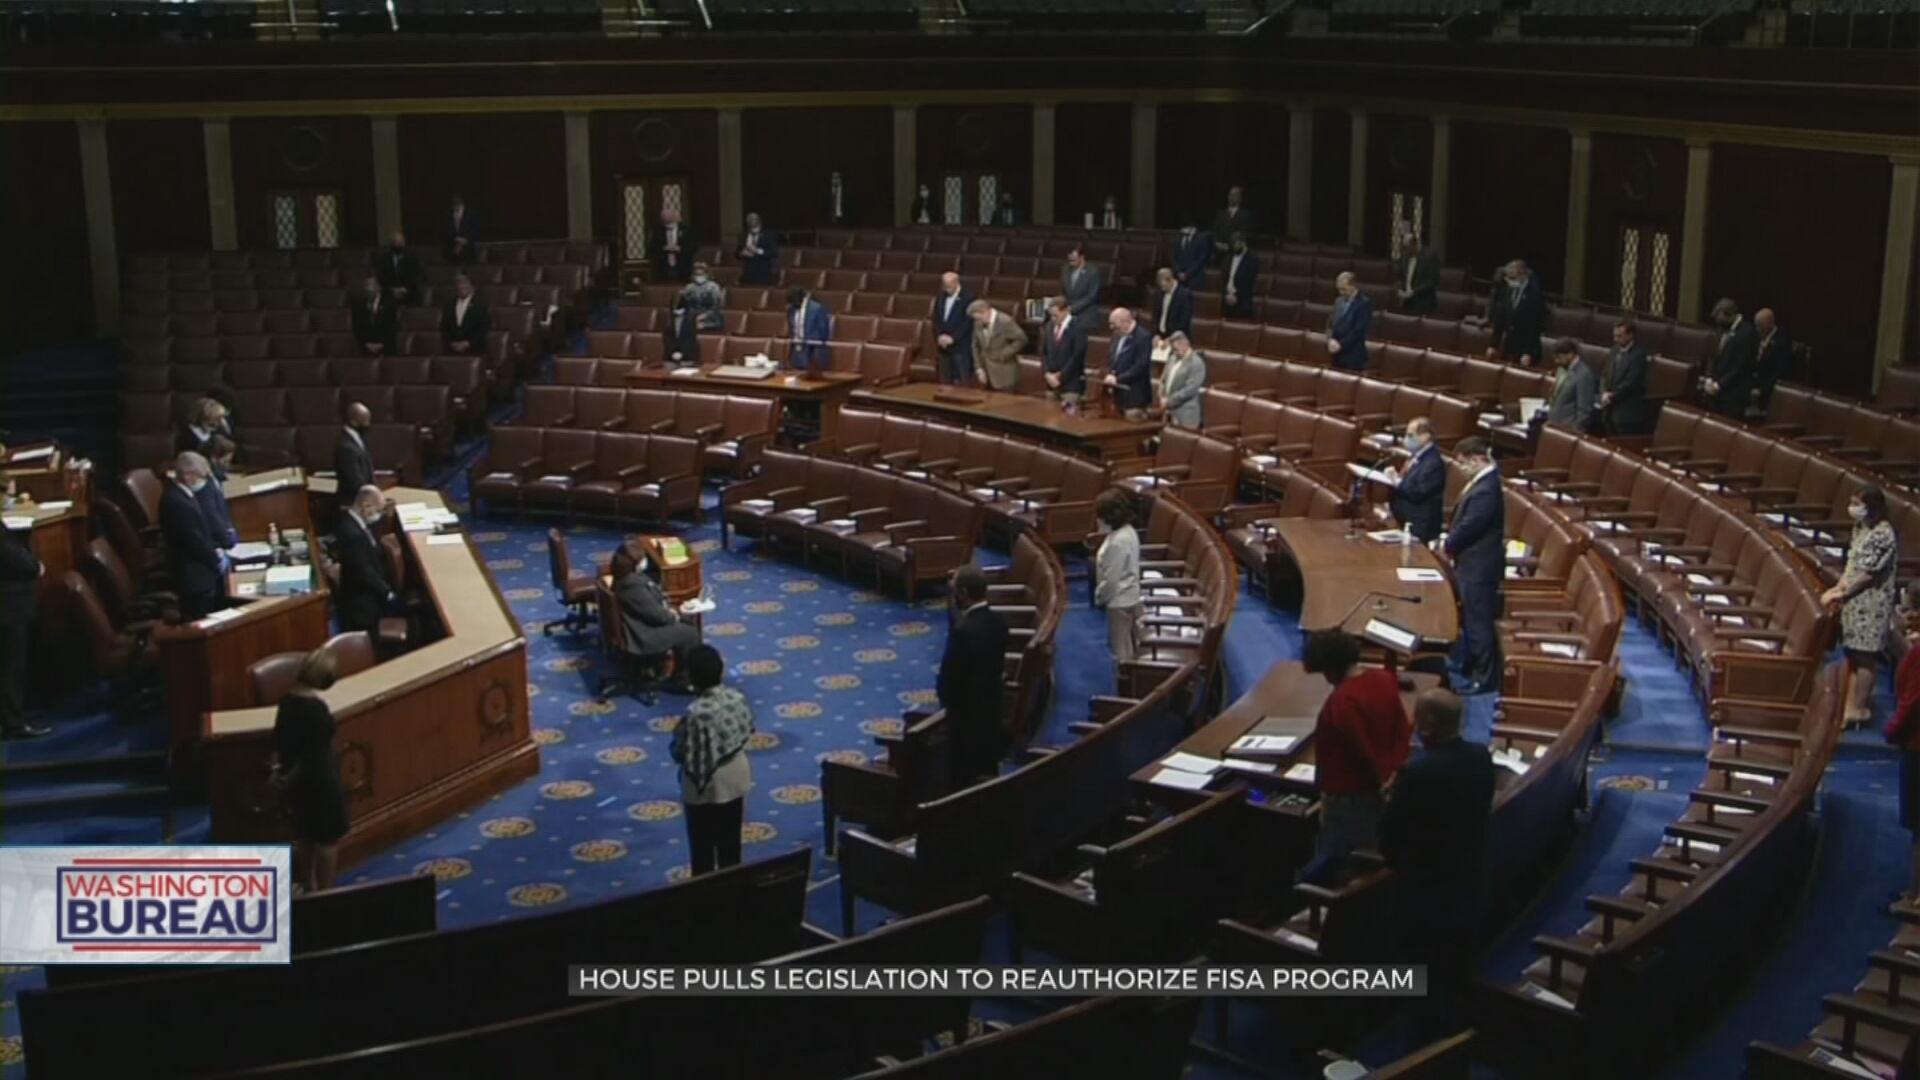 House Pulls Legislation To Reauthorize Fisa Program